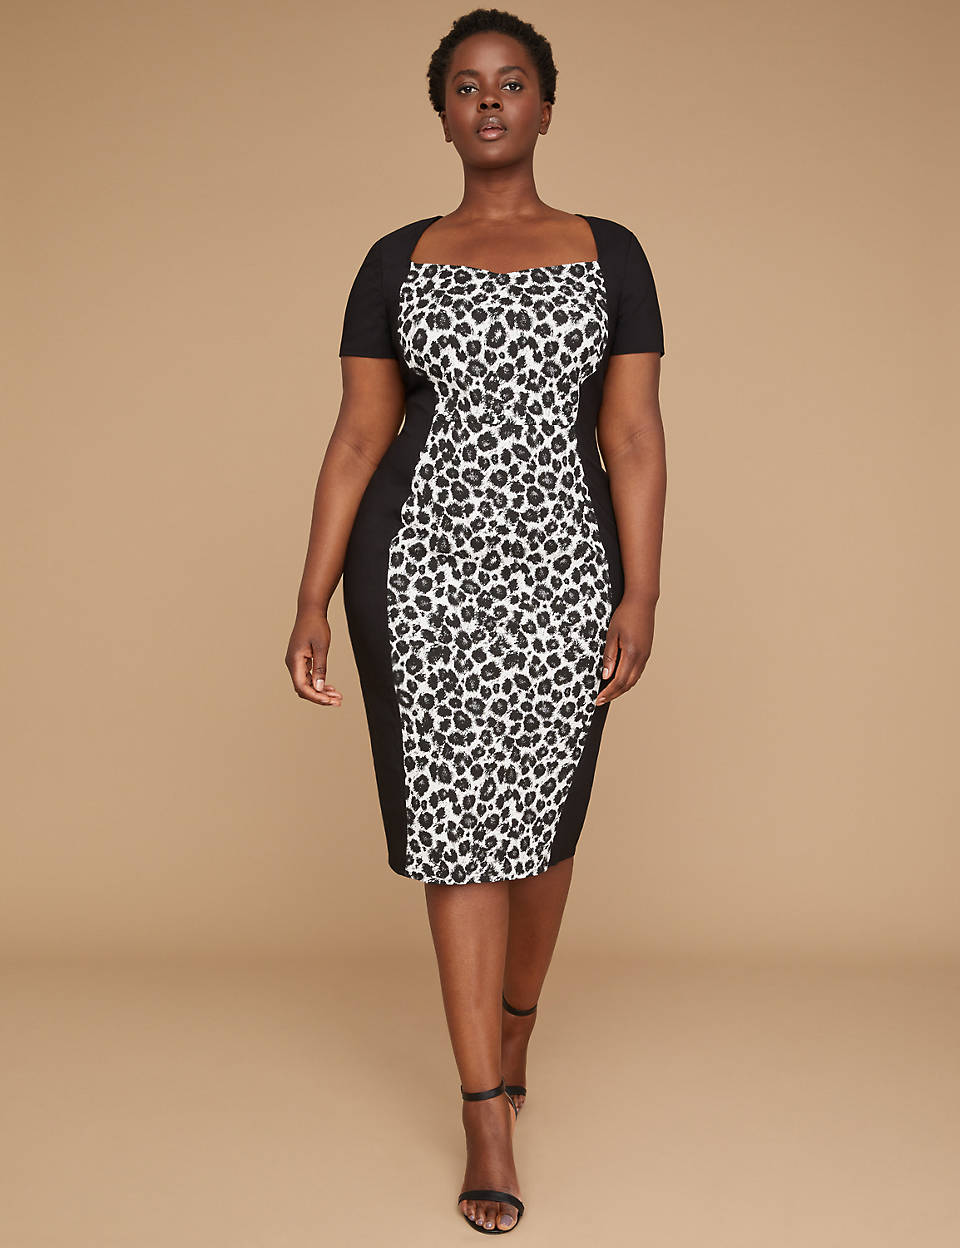 85fe95b7f82 Cheetah Print Sheath Dress